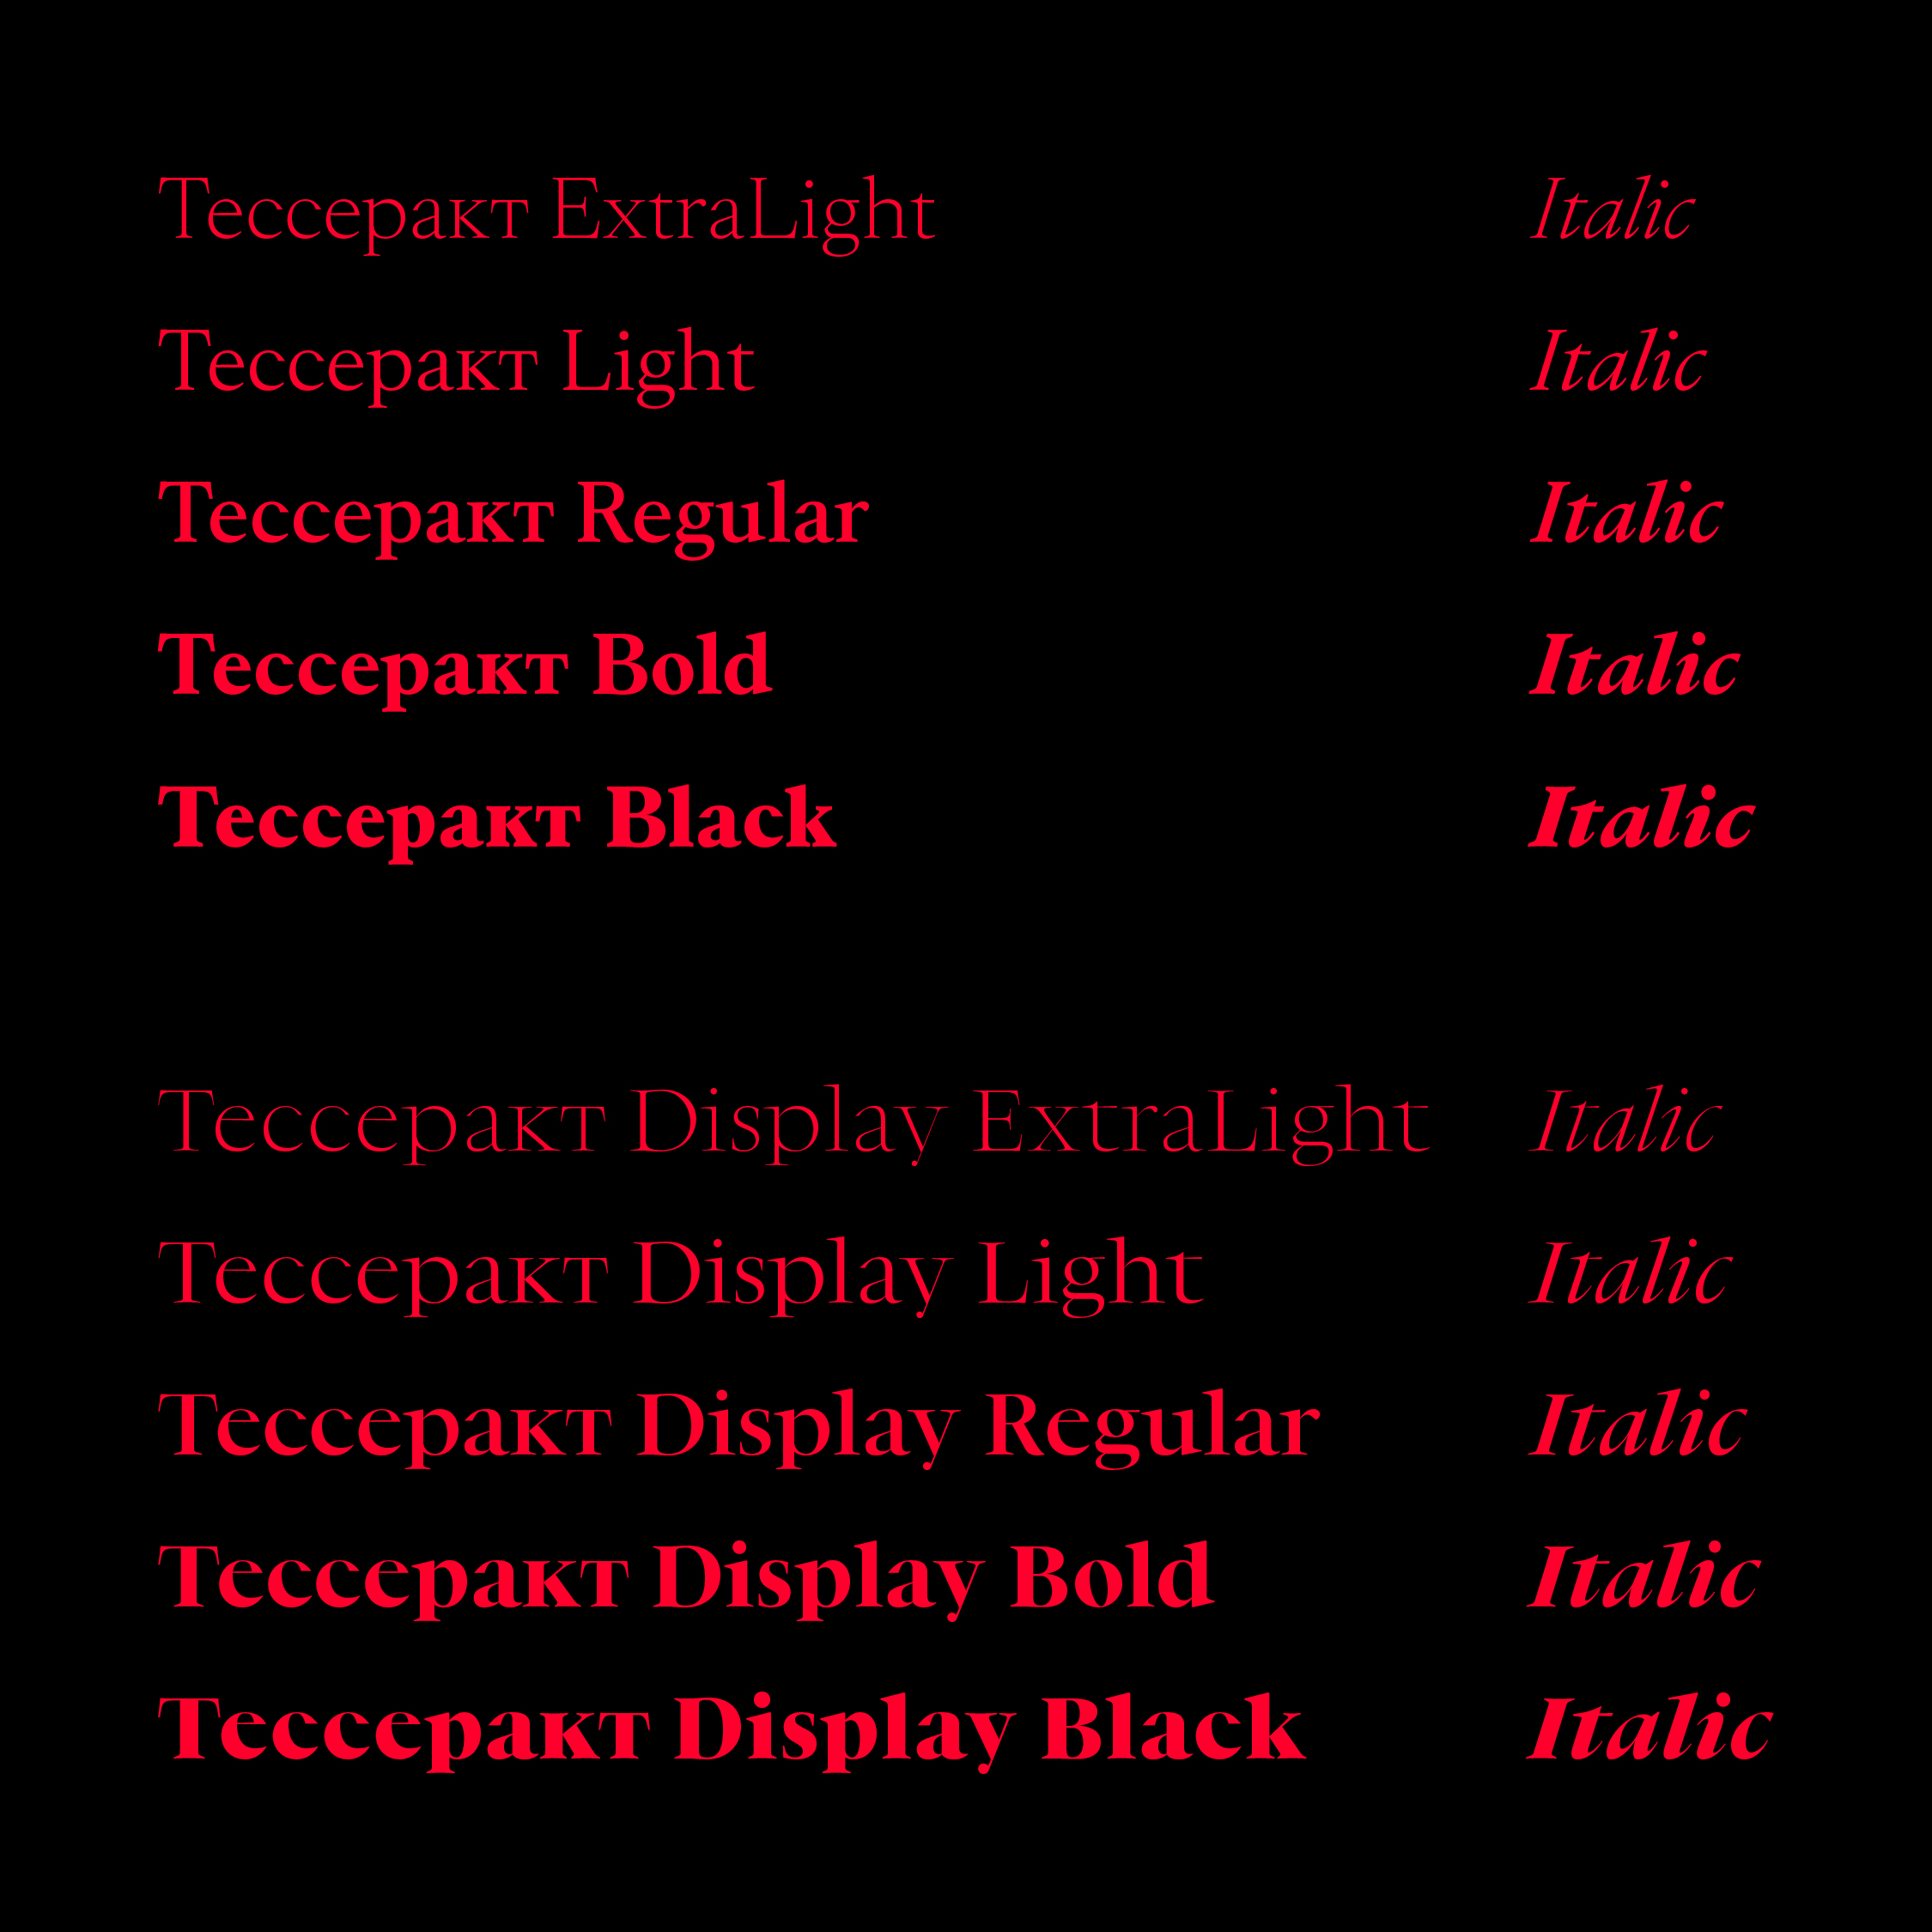 tesseract_2